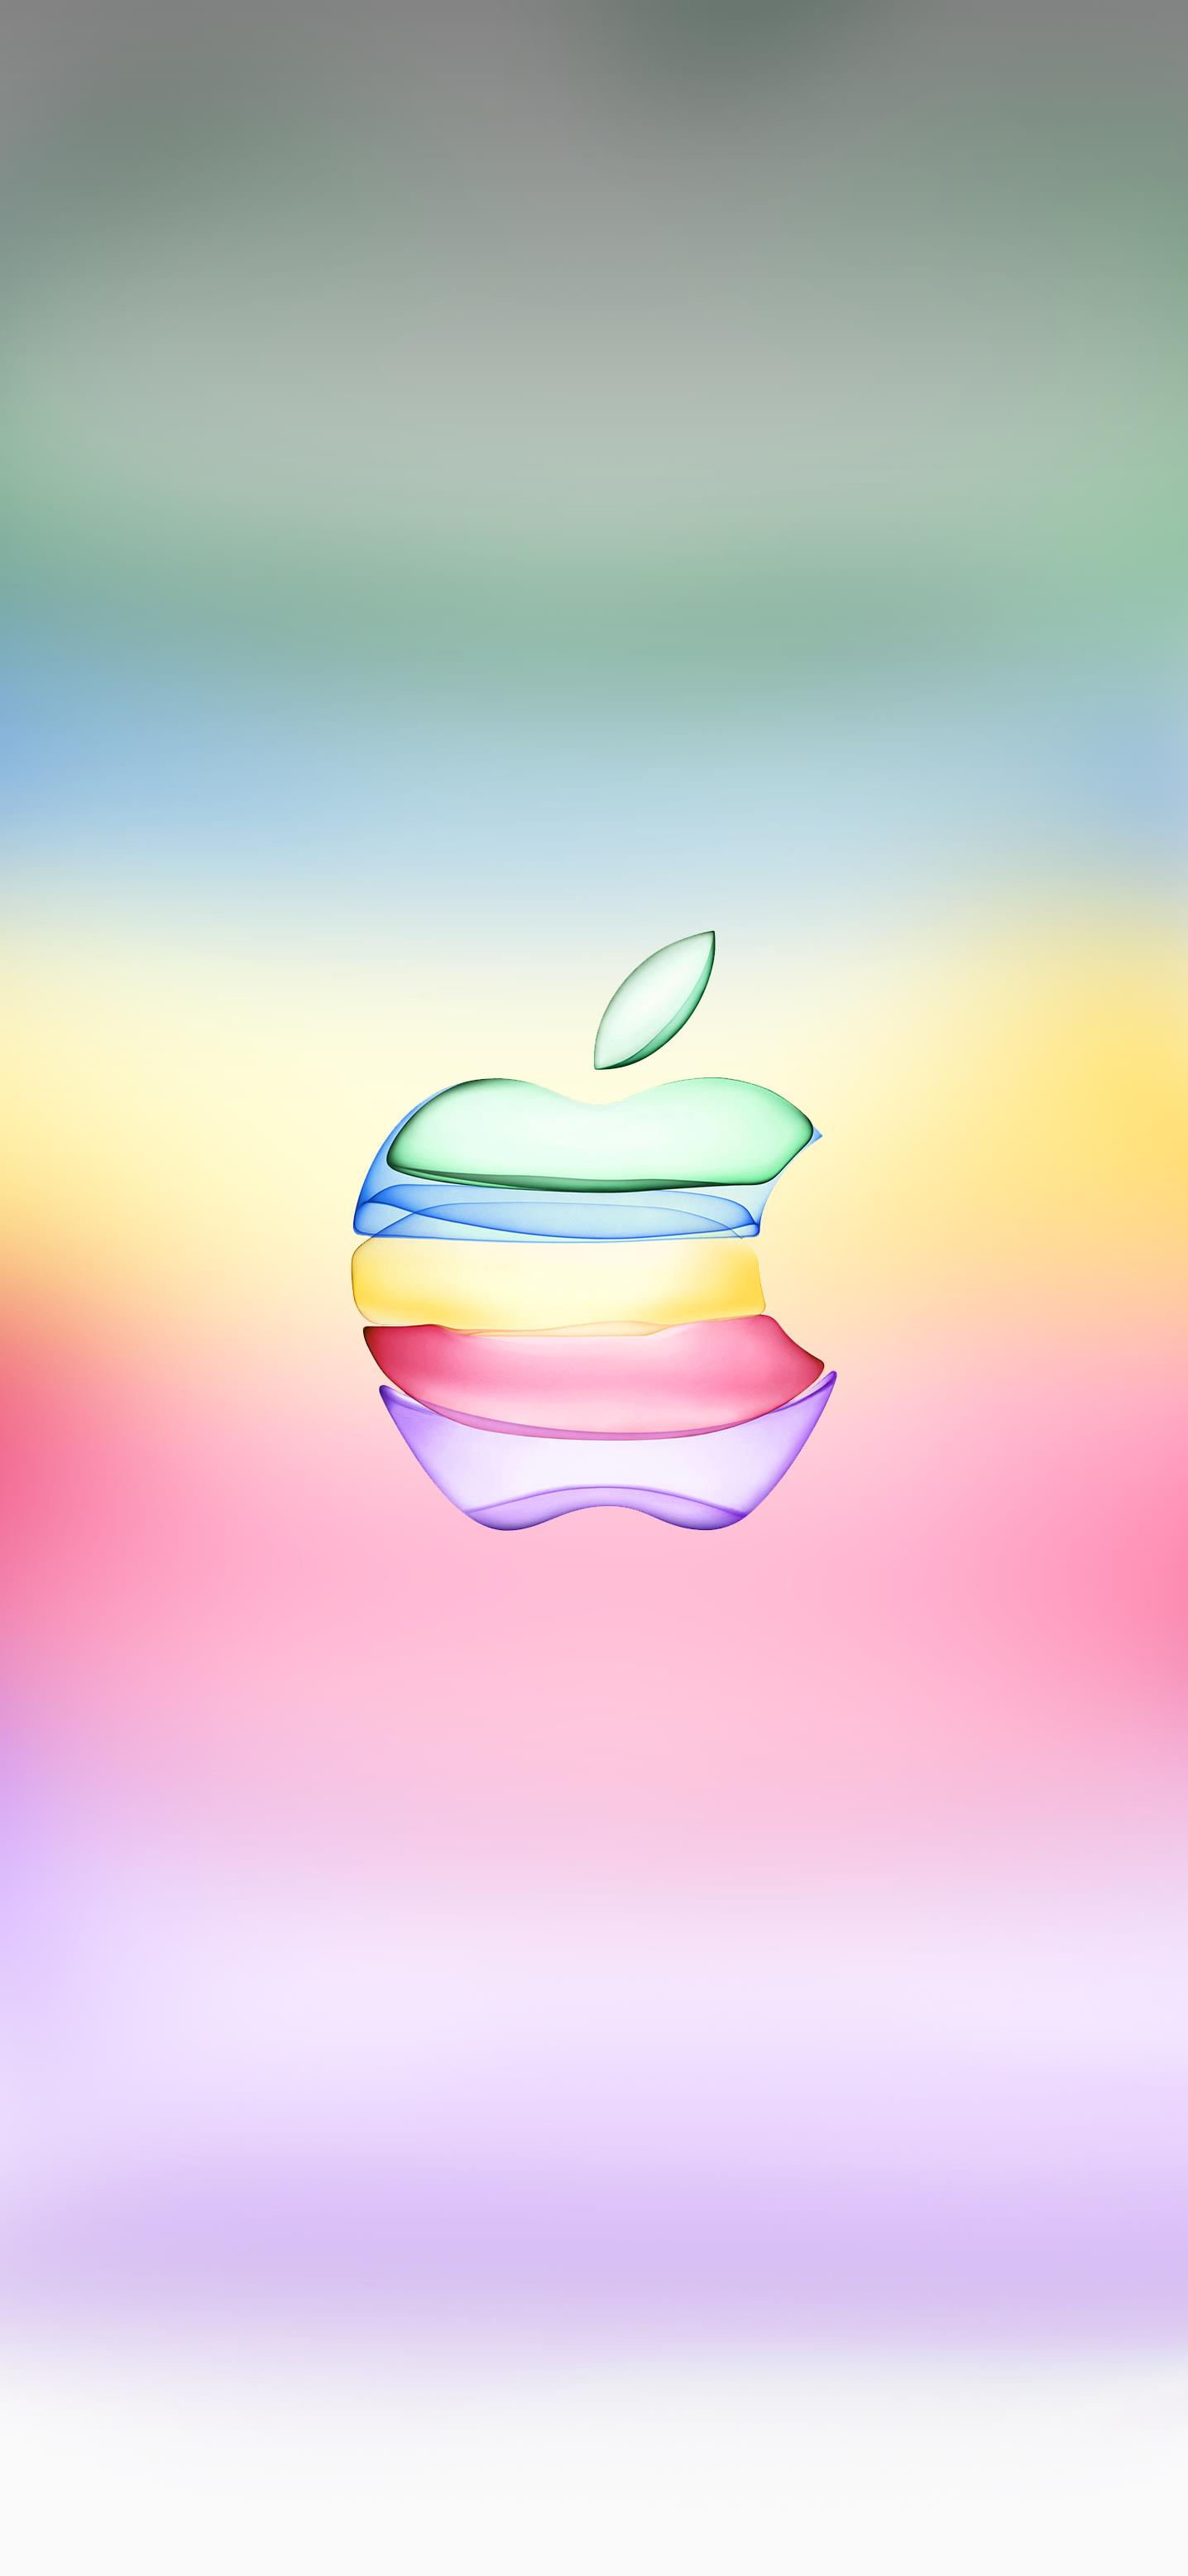 apple-event-2019-wallpaper-02-TechFoogle